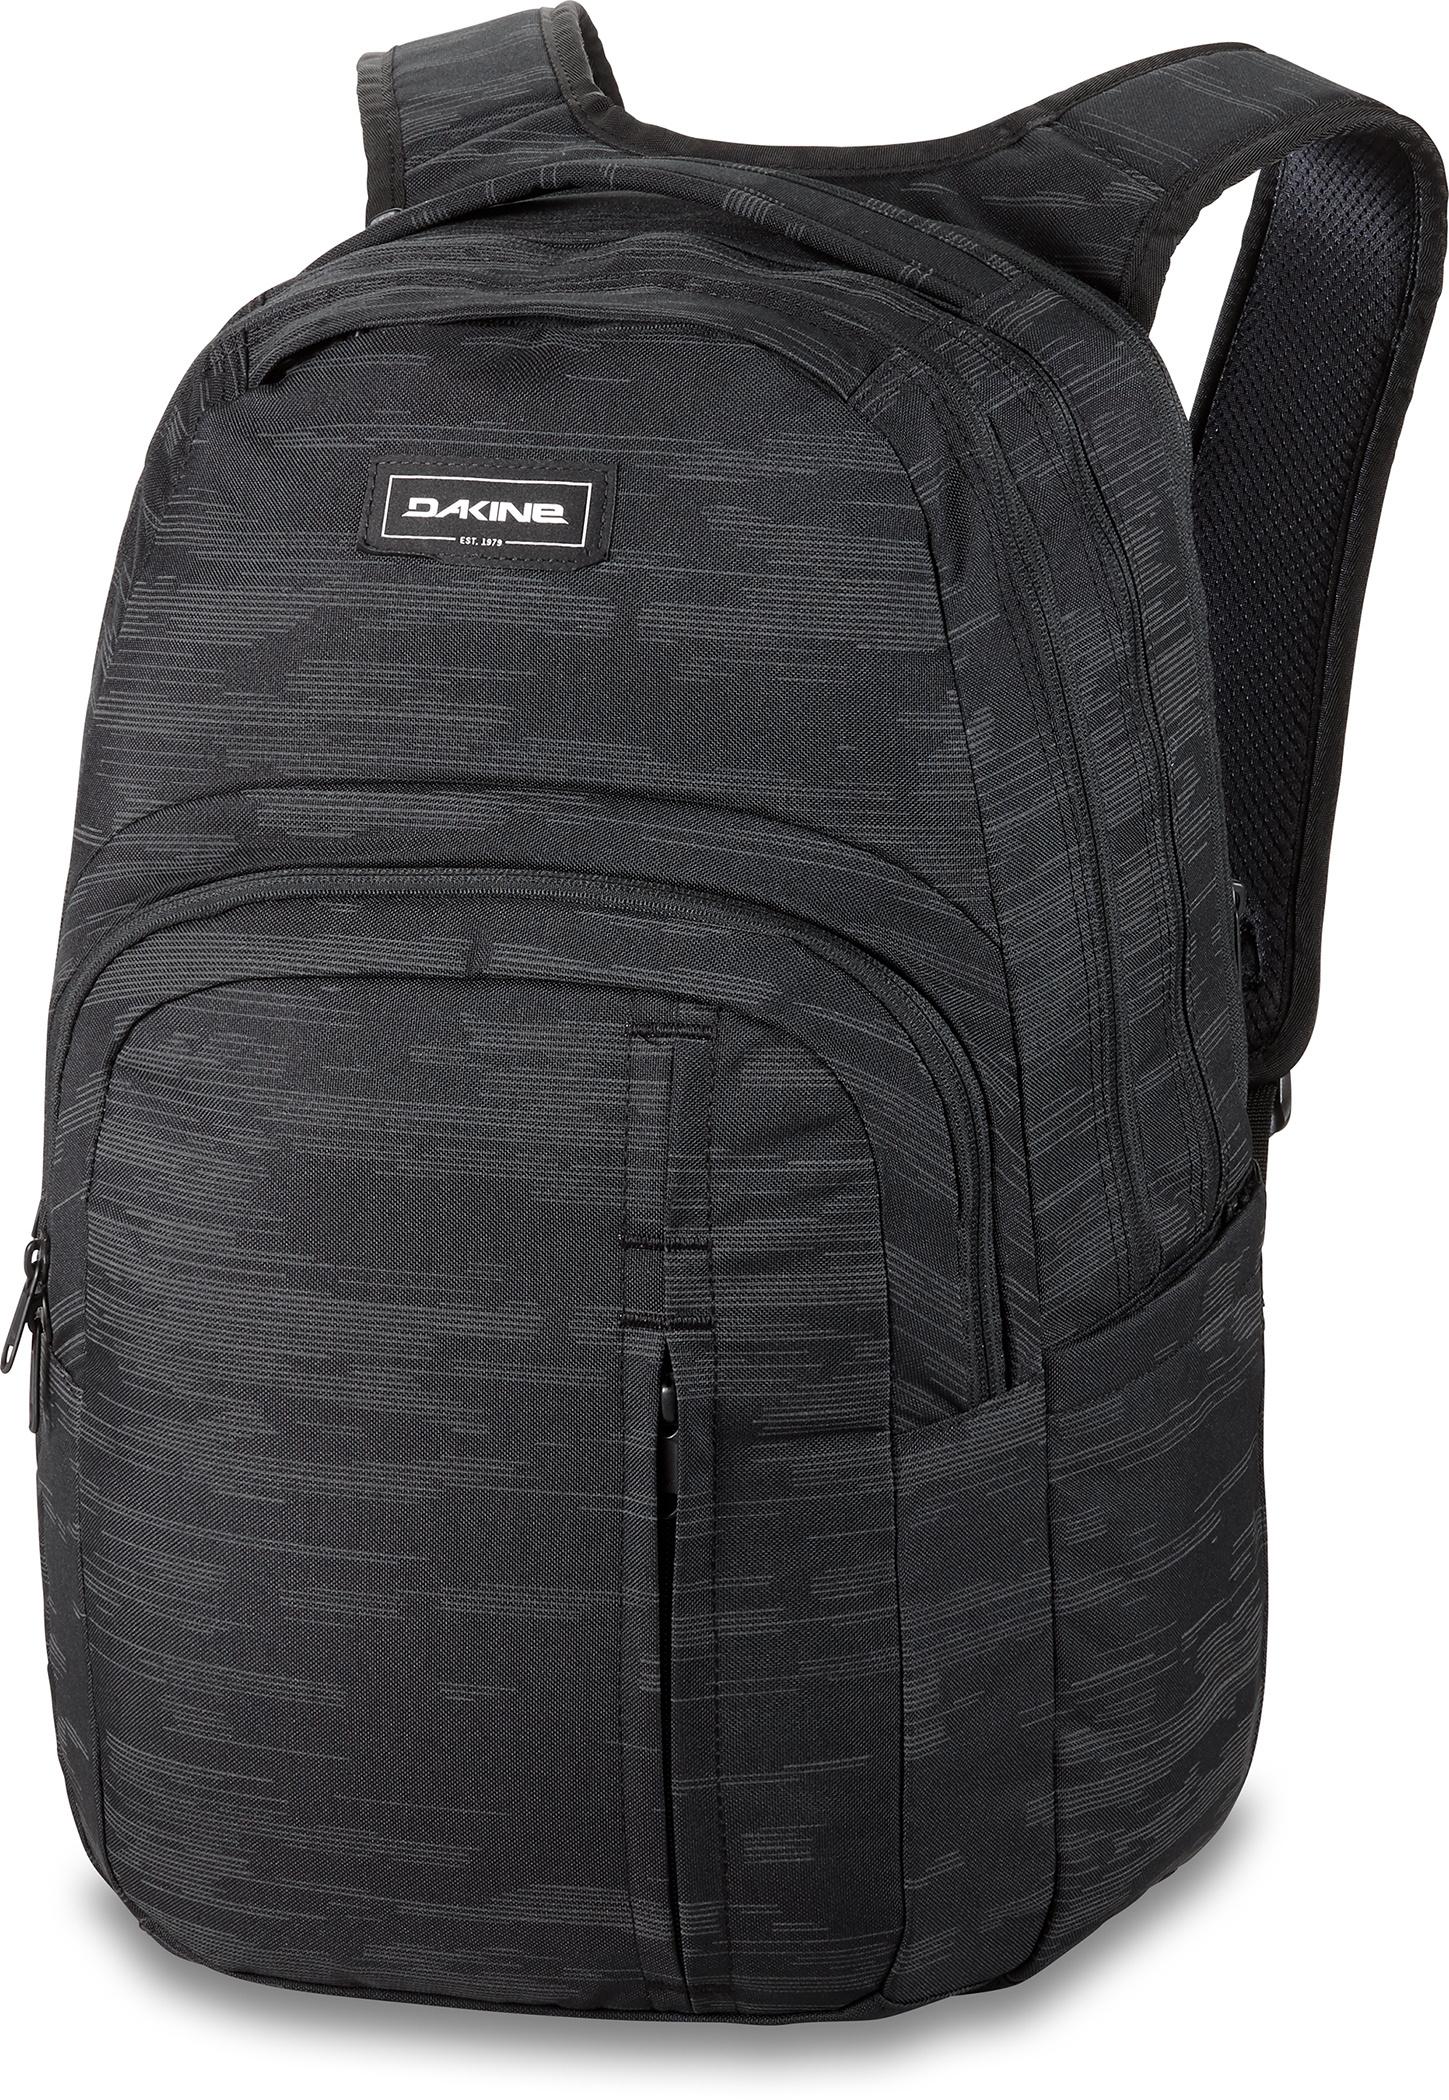 Dakine Backpack CAMPUS PREMIUM 28L Flash Reflective